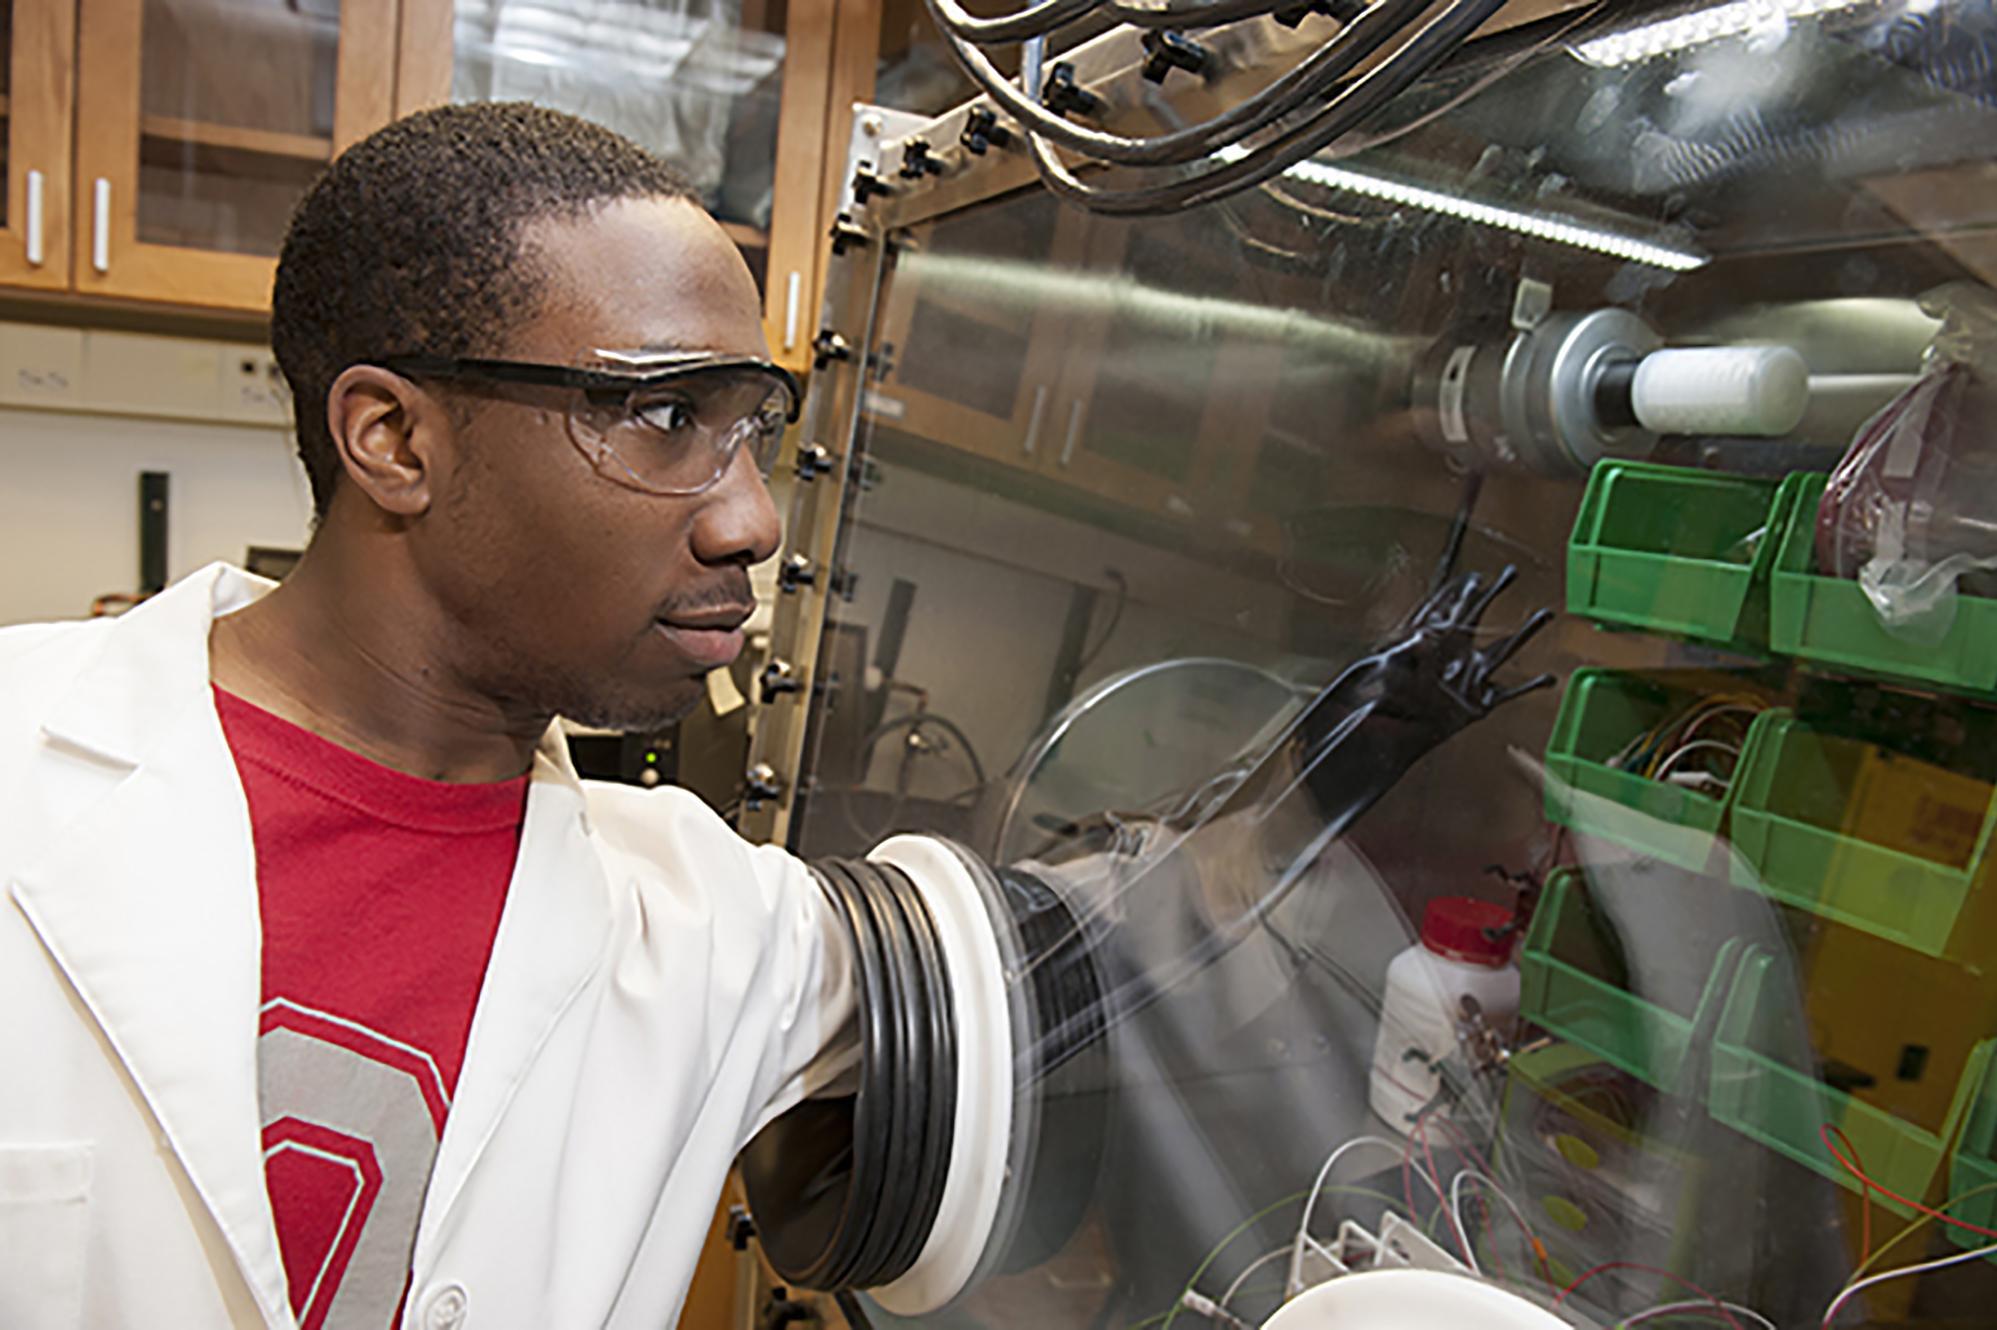 Black male doing scientific research in a lab